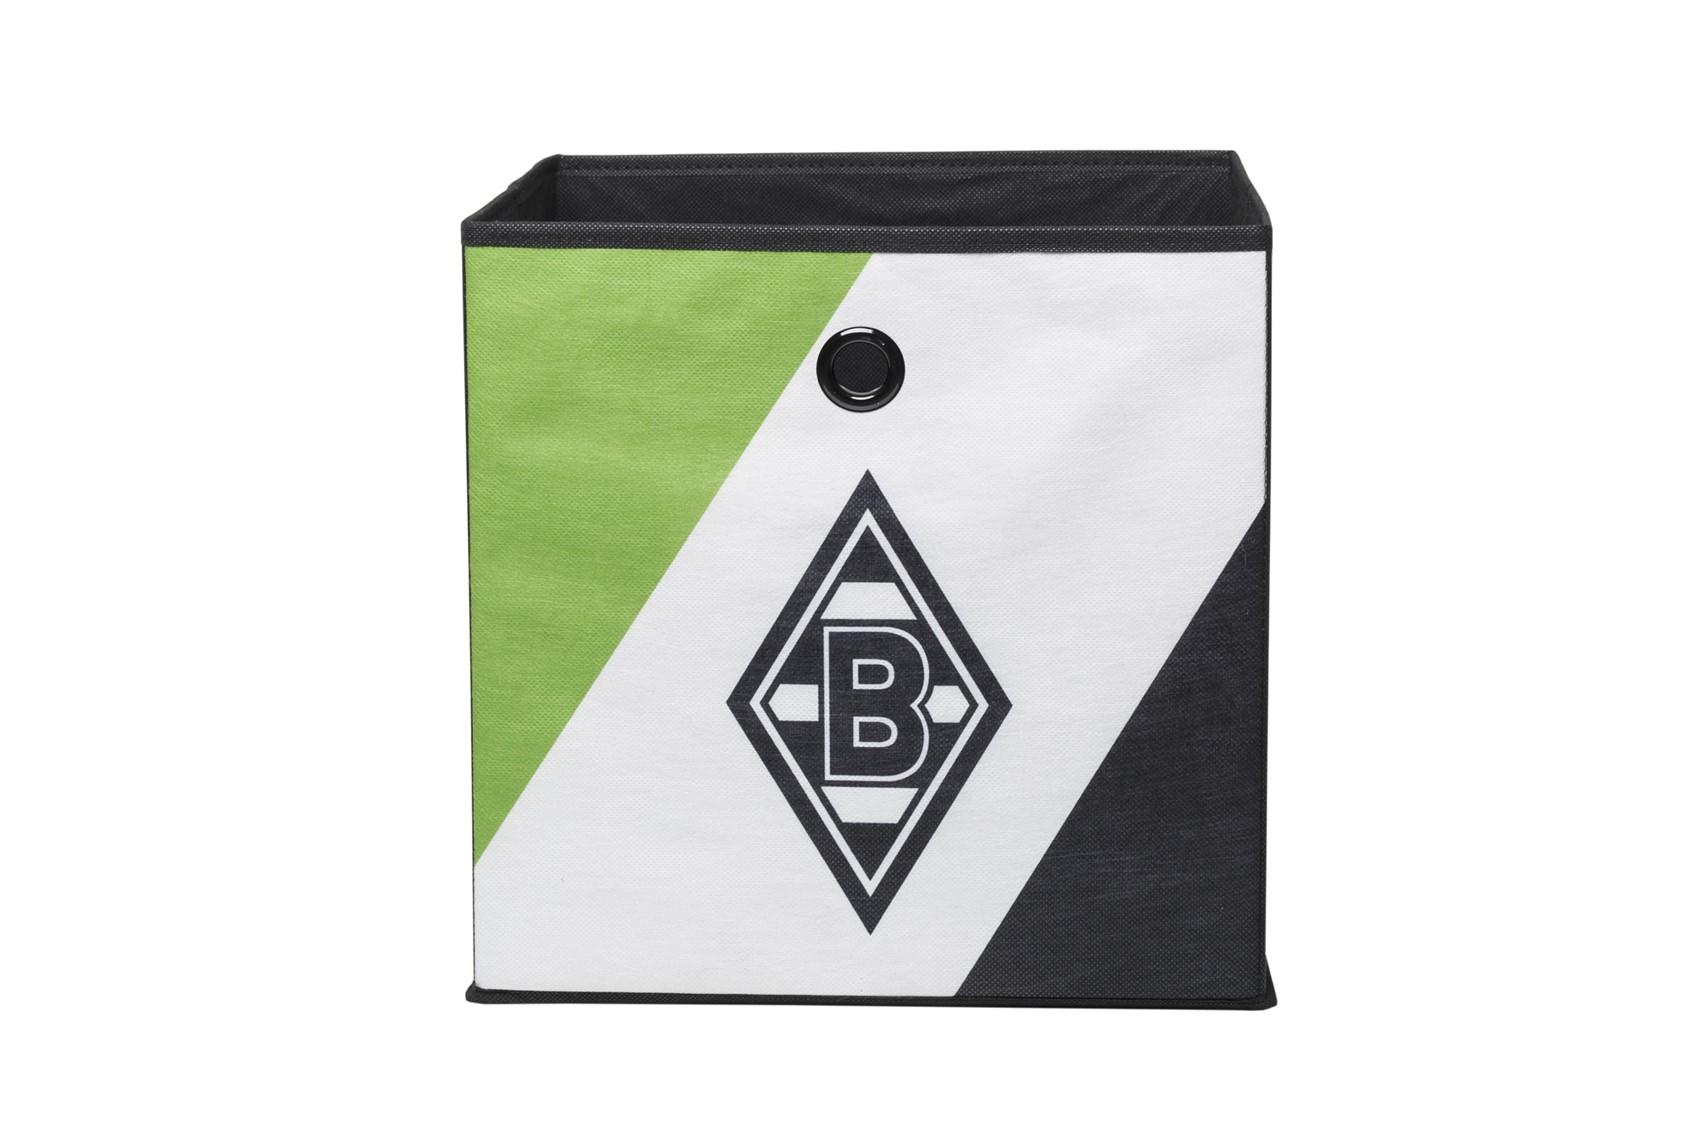 Borussia Mönchengladbach Nr.2-32 x 32 cm 3er Set Faltbox Box